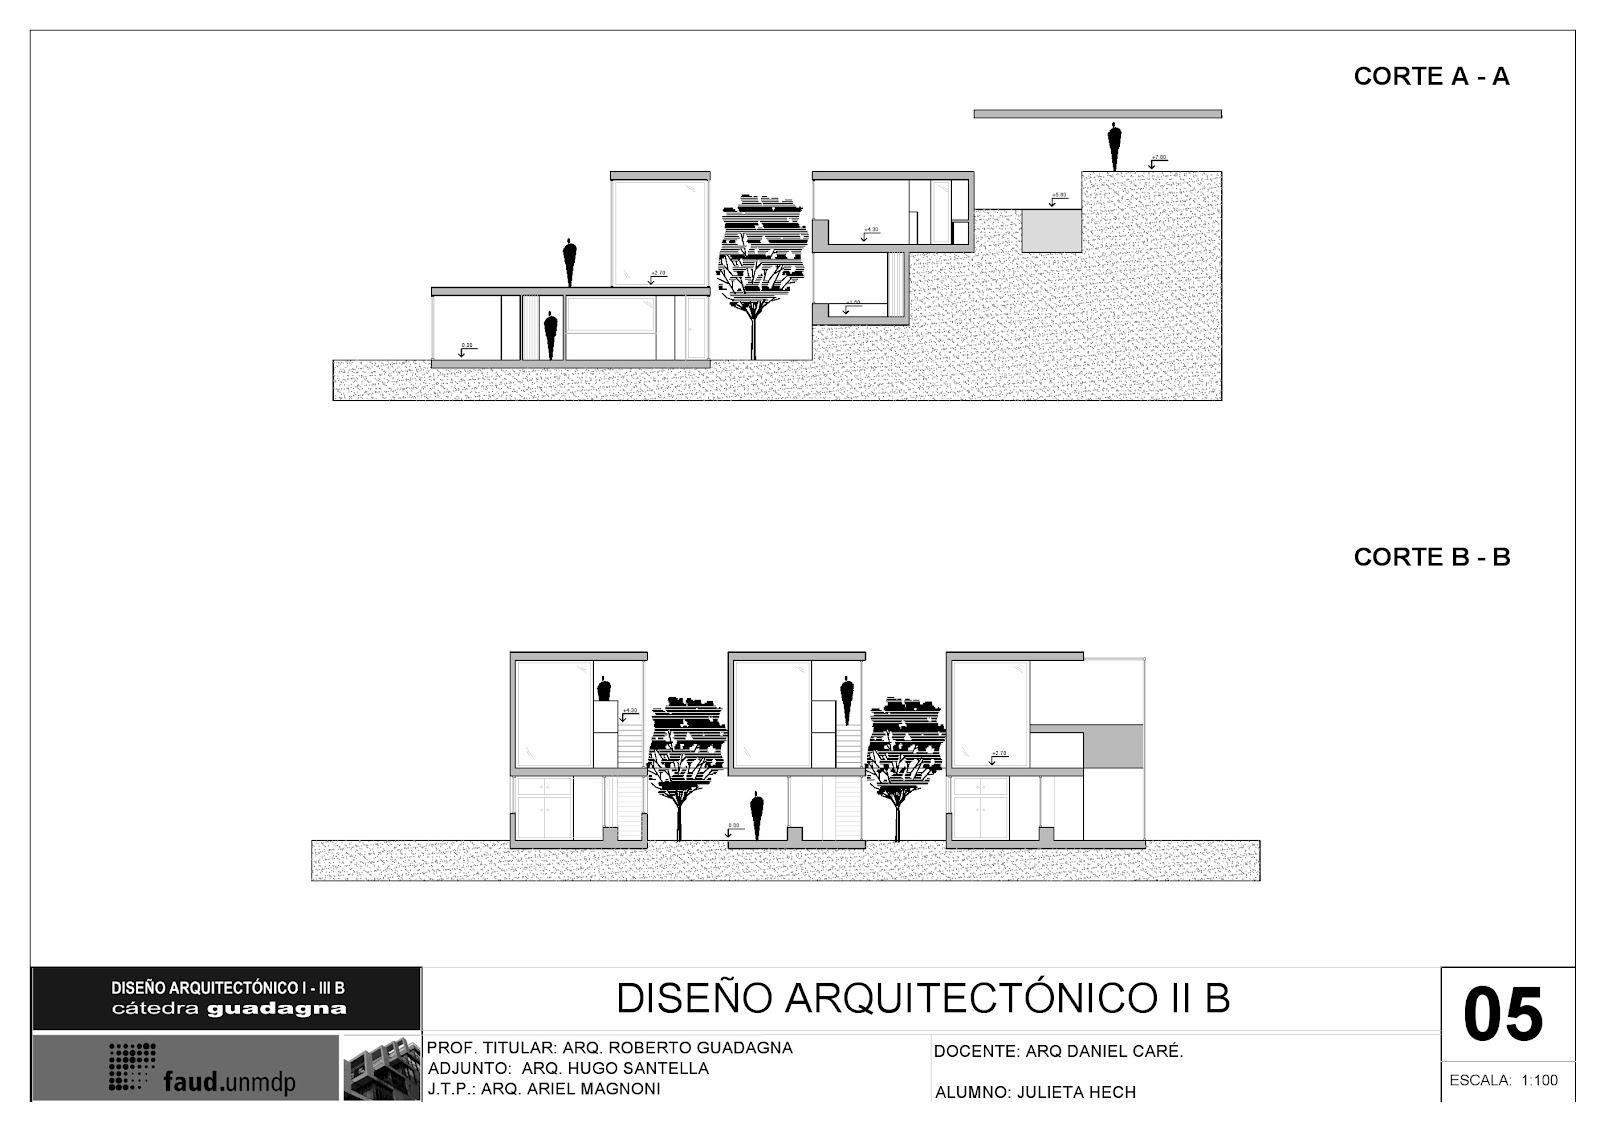 Dise O Arquitectonico Cgii Esquicios